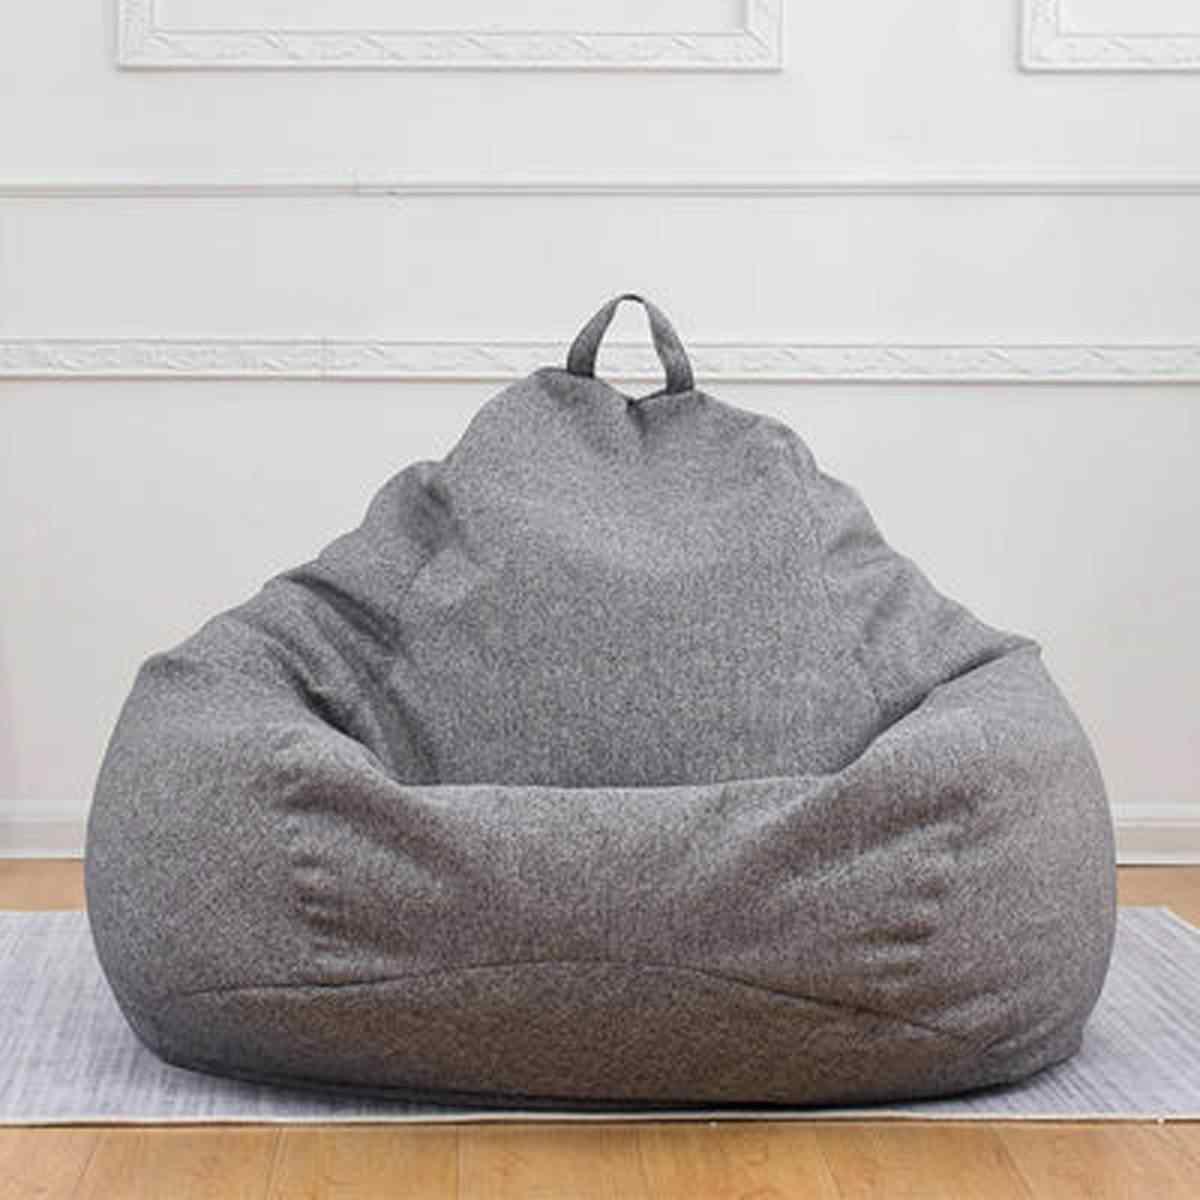 120x120 CM Grote Zitzak Sofa Stoel Cover Lounger Poef Zetel Woonkamer Meubels Zitzak Bed Poef Bladerdeeg bank Lazy Tatami